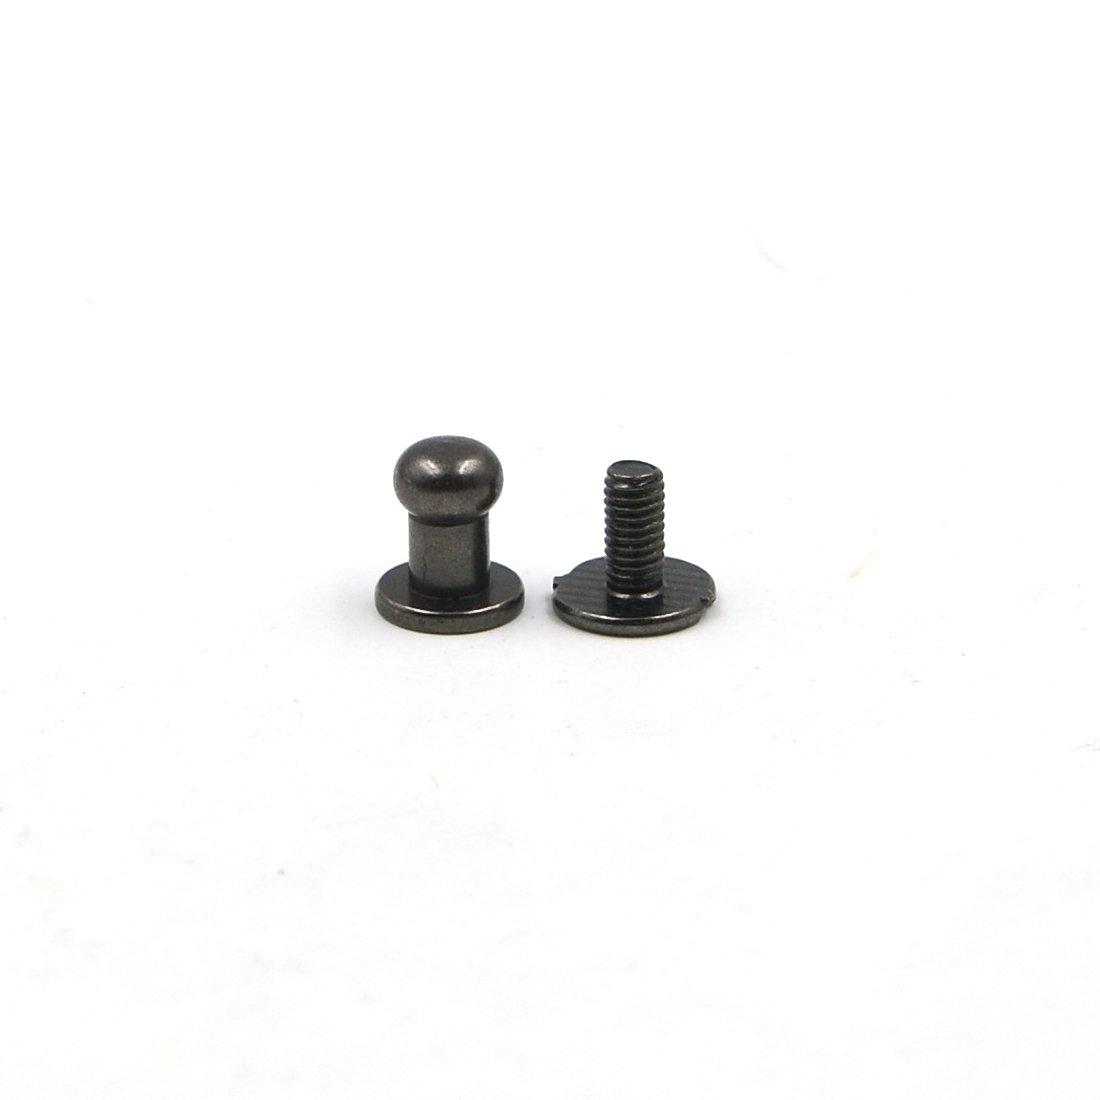 5mm 6mm 8mm Screws Back Round Head Nail Rivet Bag Chicago Stud Copper Leather